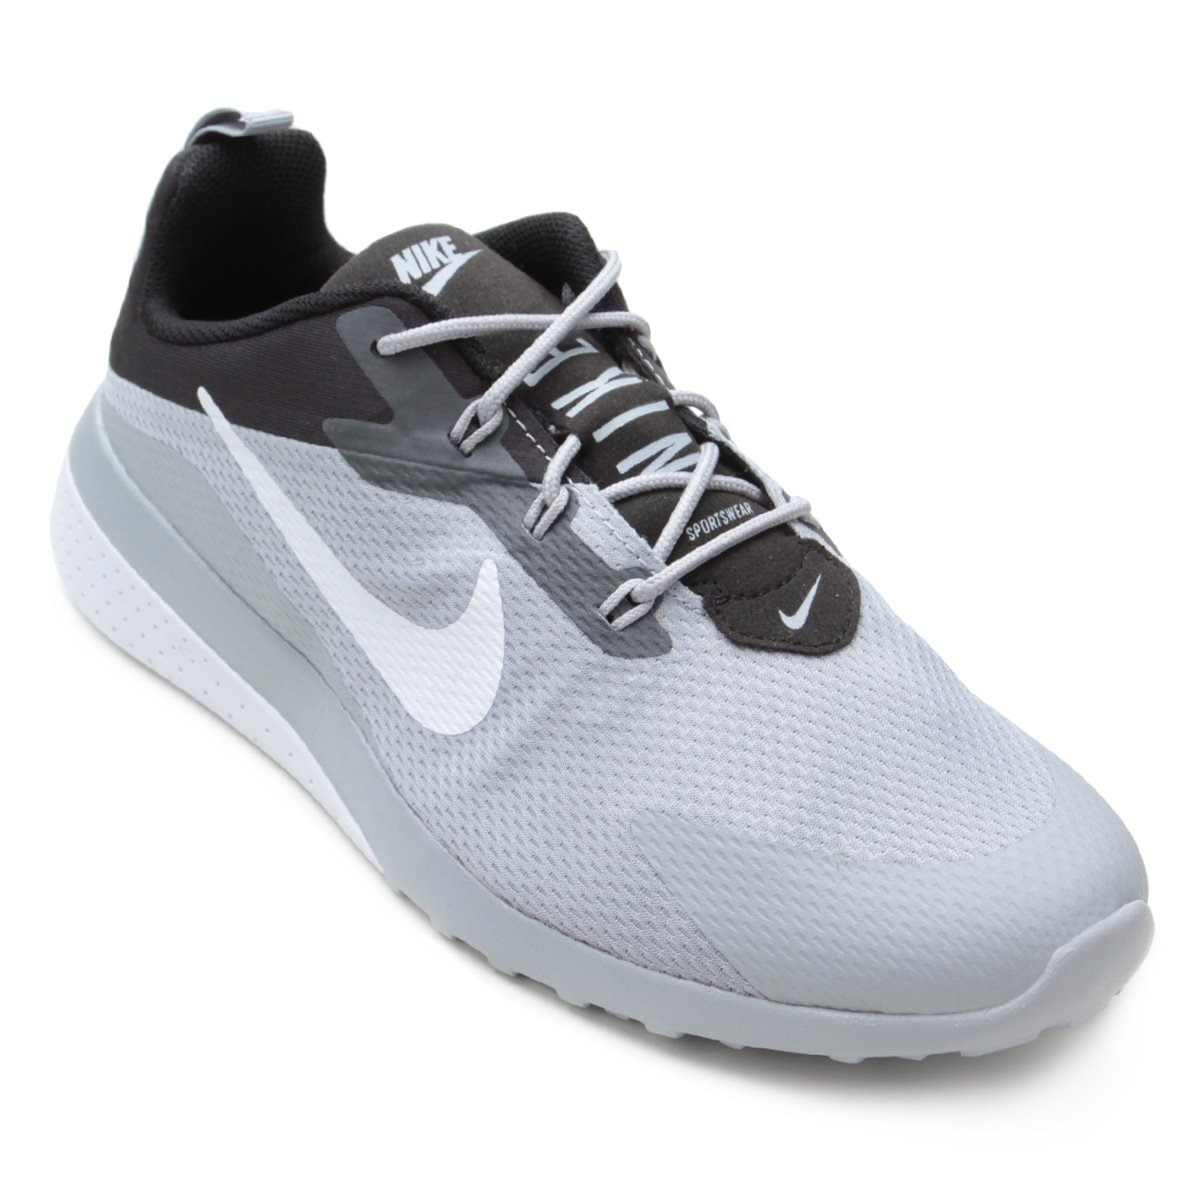 Tênis Nike CK Racer 2 Masculino - Cinza e Preto - Compre Agora ... 1b6a6321ec